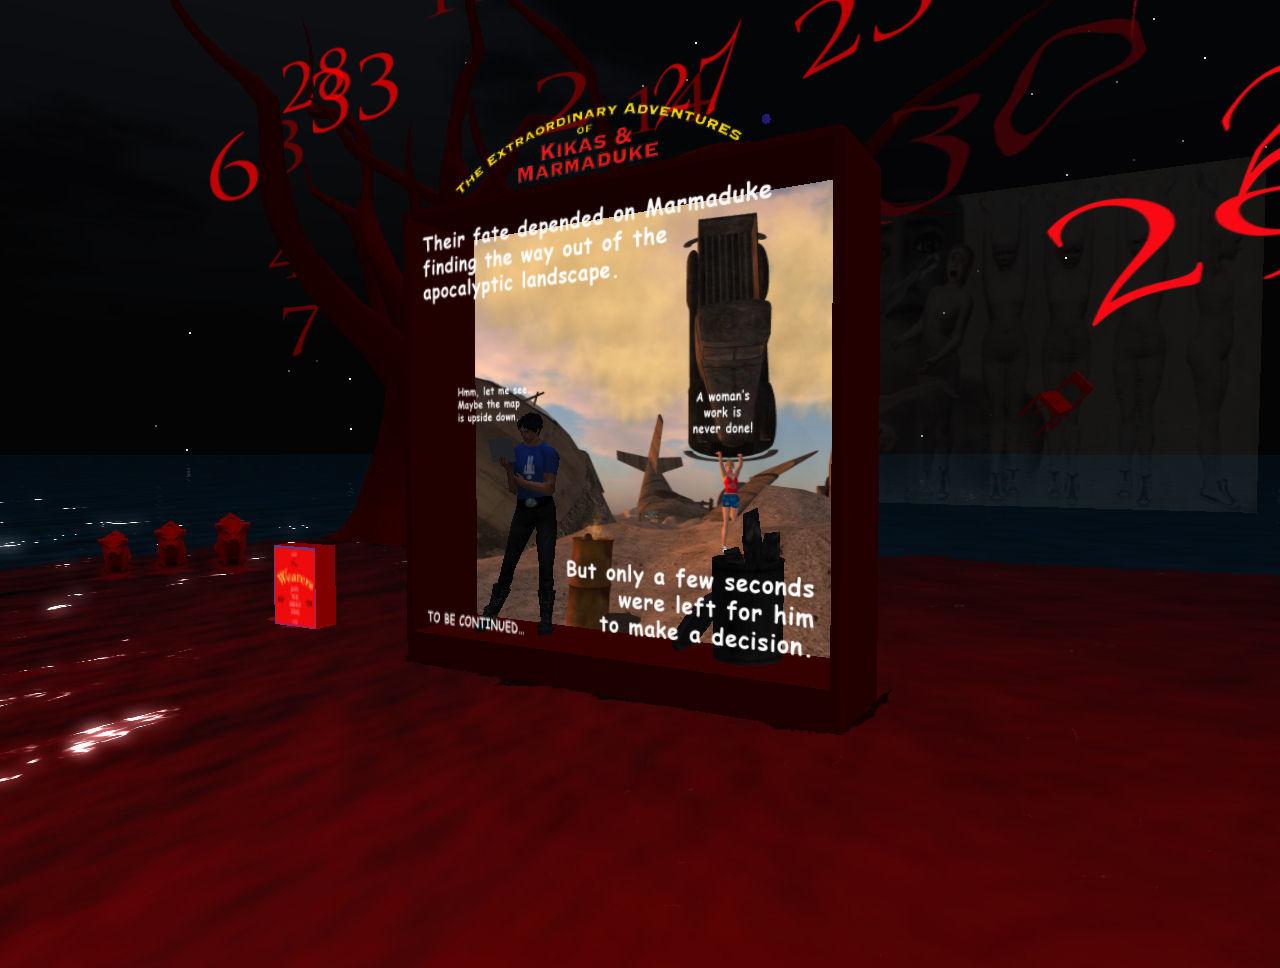 Jual Murah Respiro Watch S 001 Terbaru 2018 Jam Tangan Swatch Original 100 Susg403 Racing Roar Casual Trendy Rose Borchovski Archivi Virtual Worlds Magazine Marmaduke